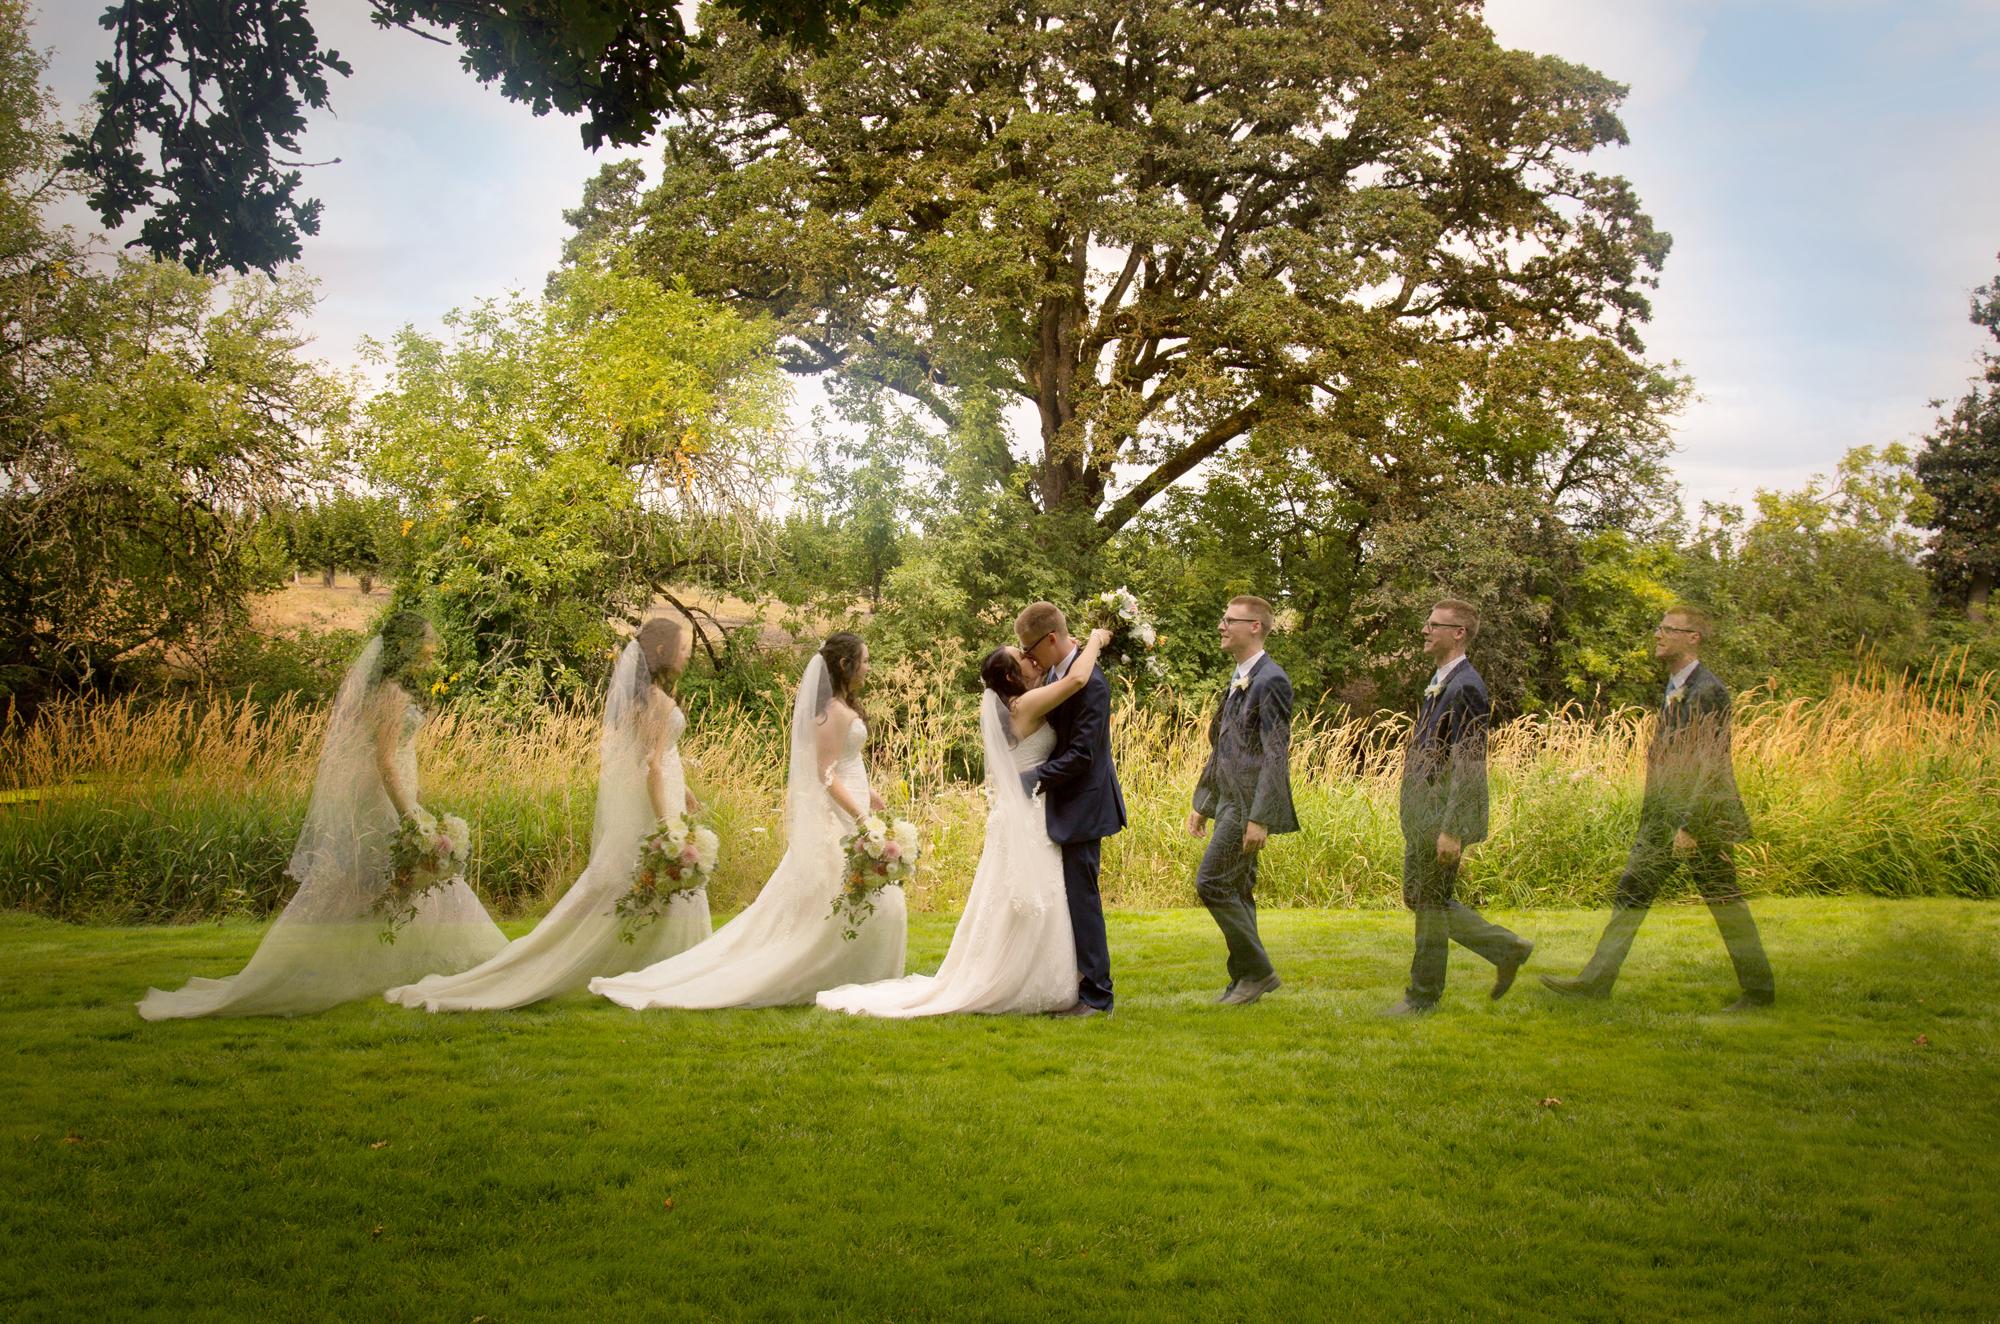 Unique wedding professional photographer ideas